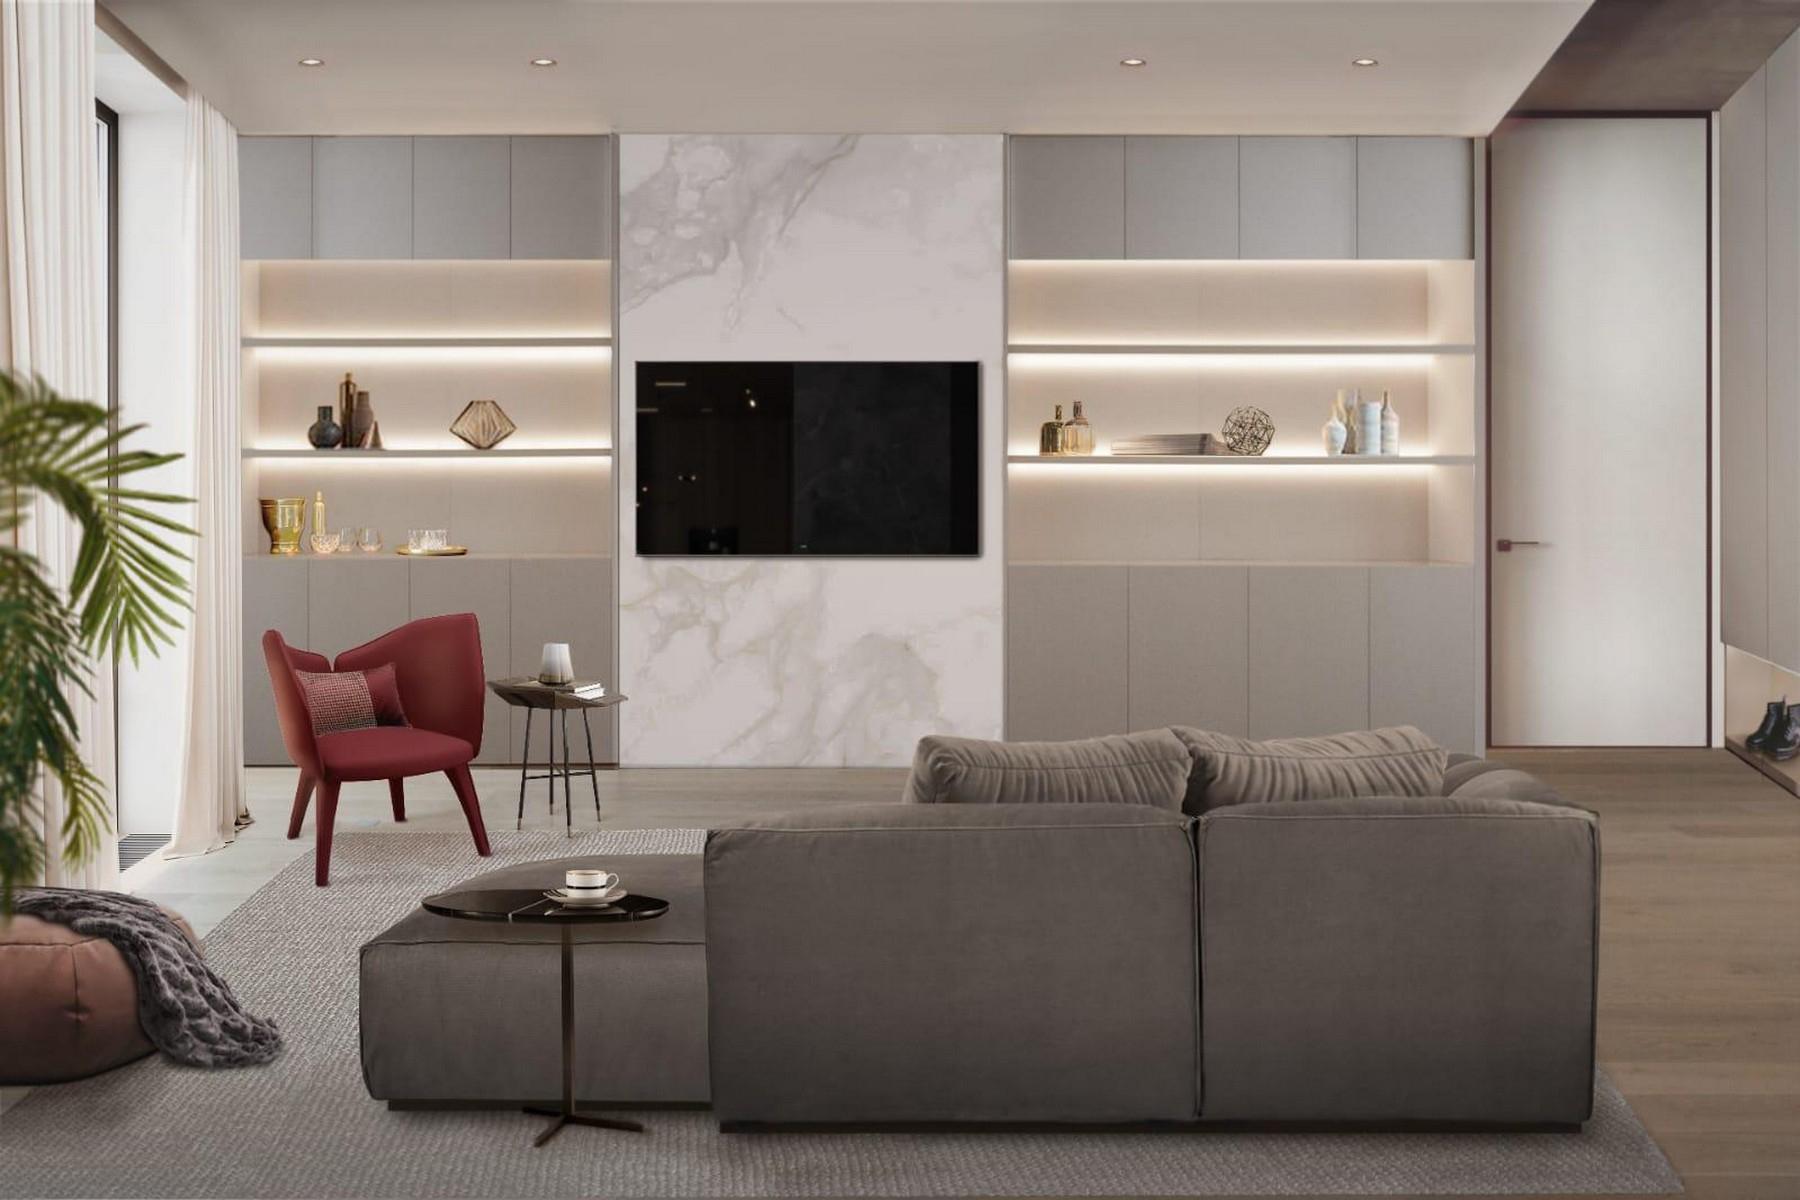 Apartments for Sale at Elegant first floor apartment in the center of Desenzano Desenzano Del Garda, Brescia Italy